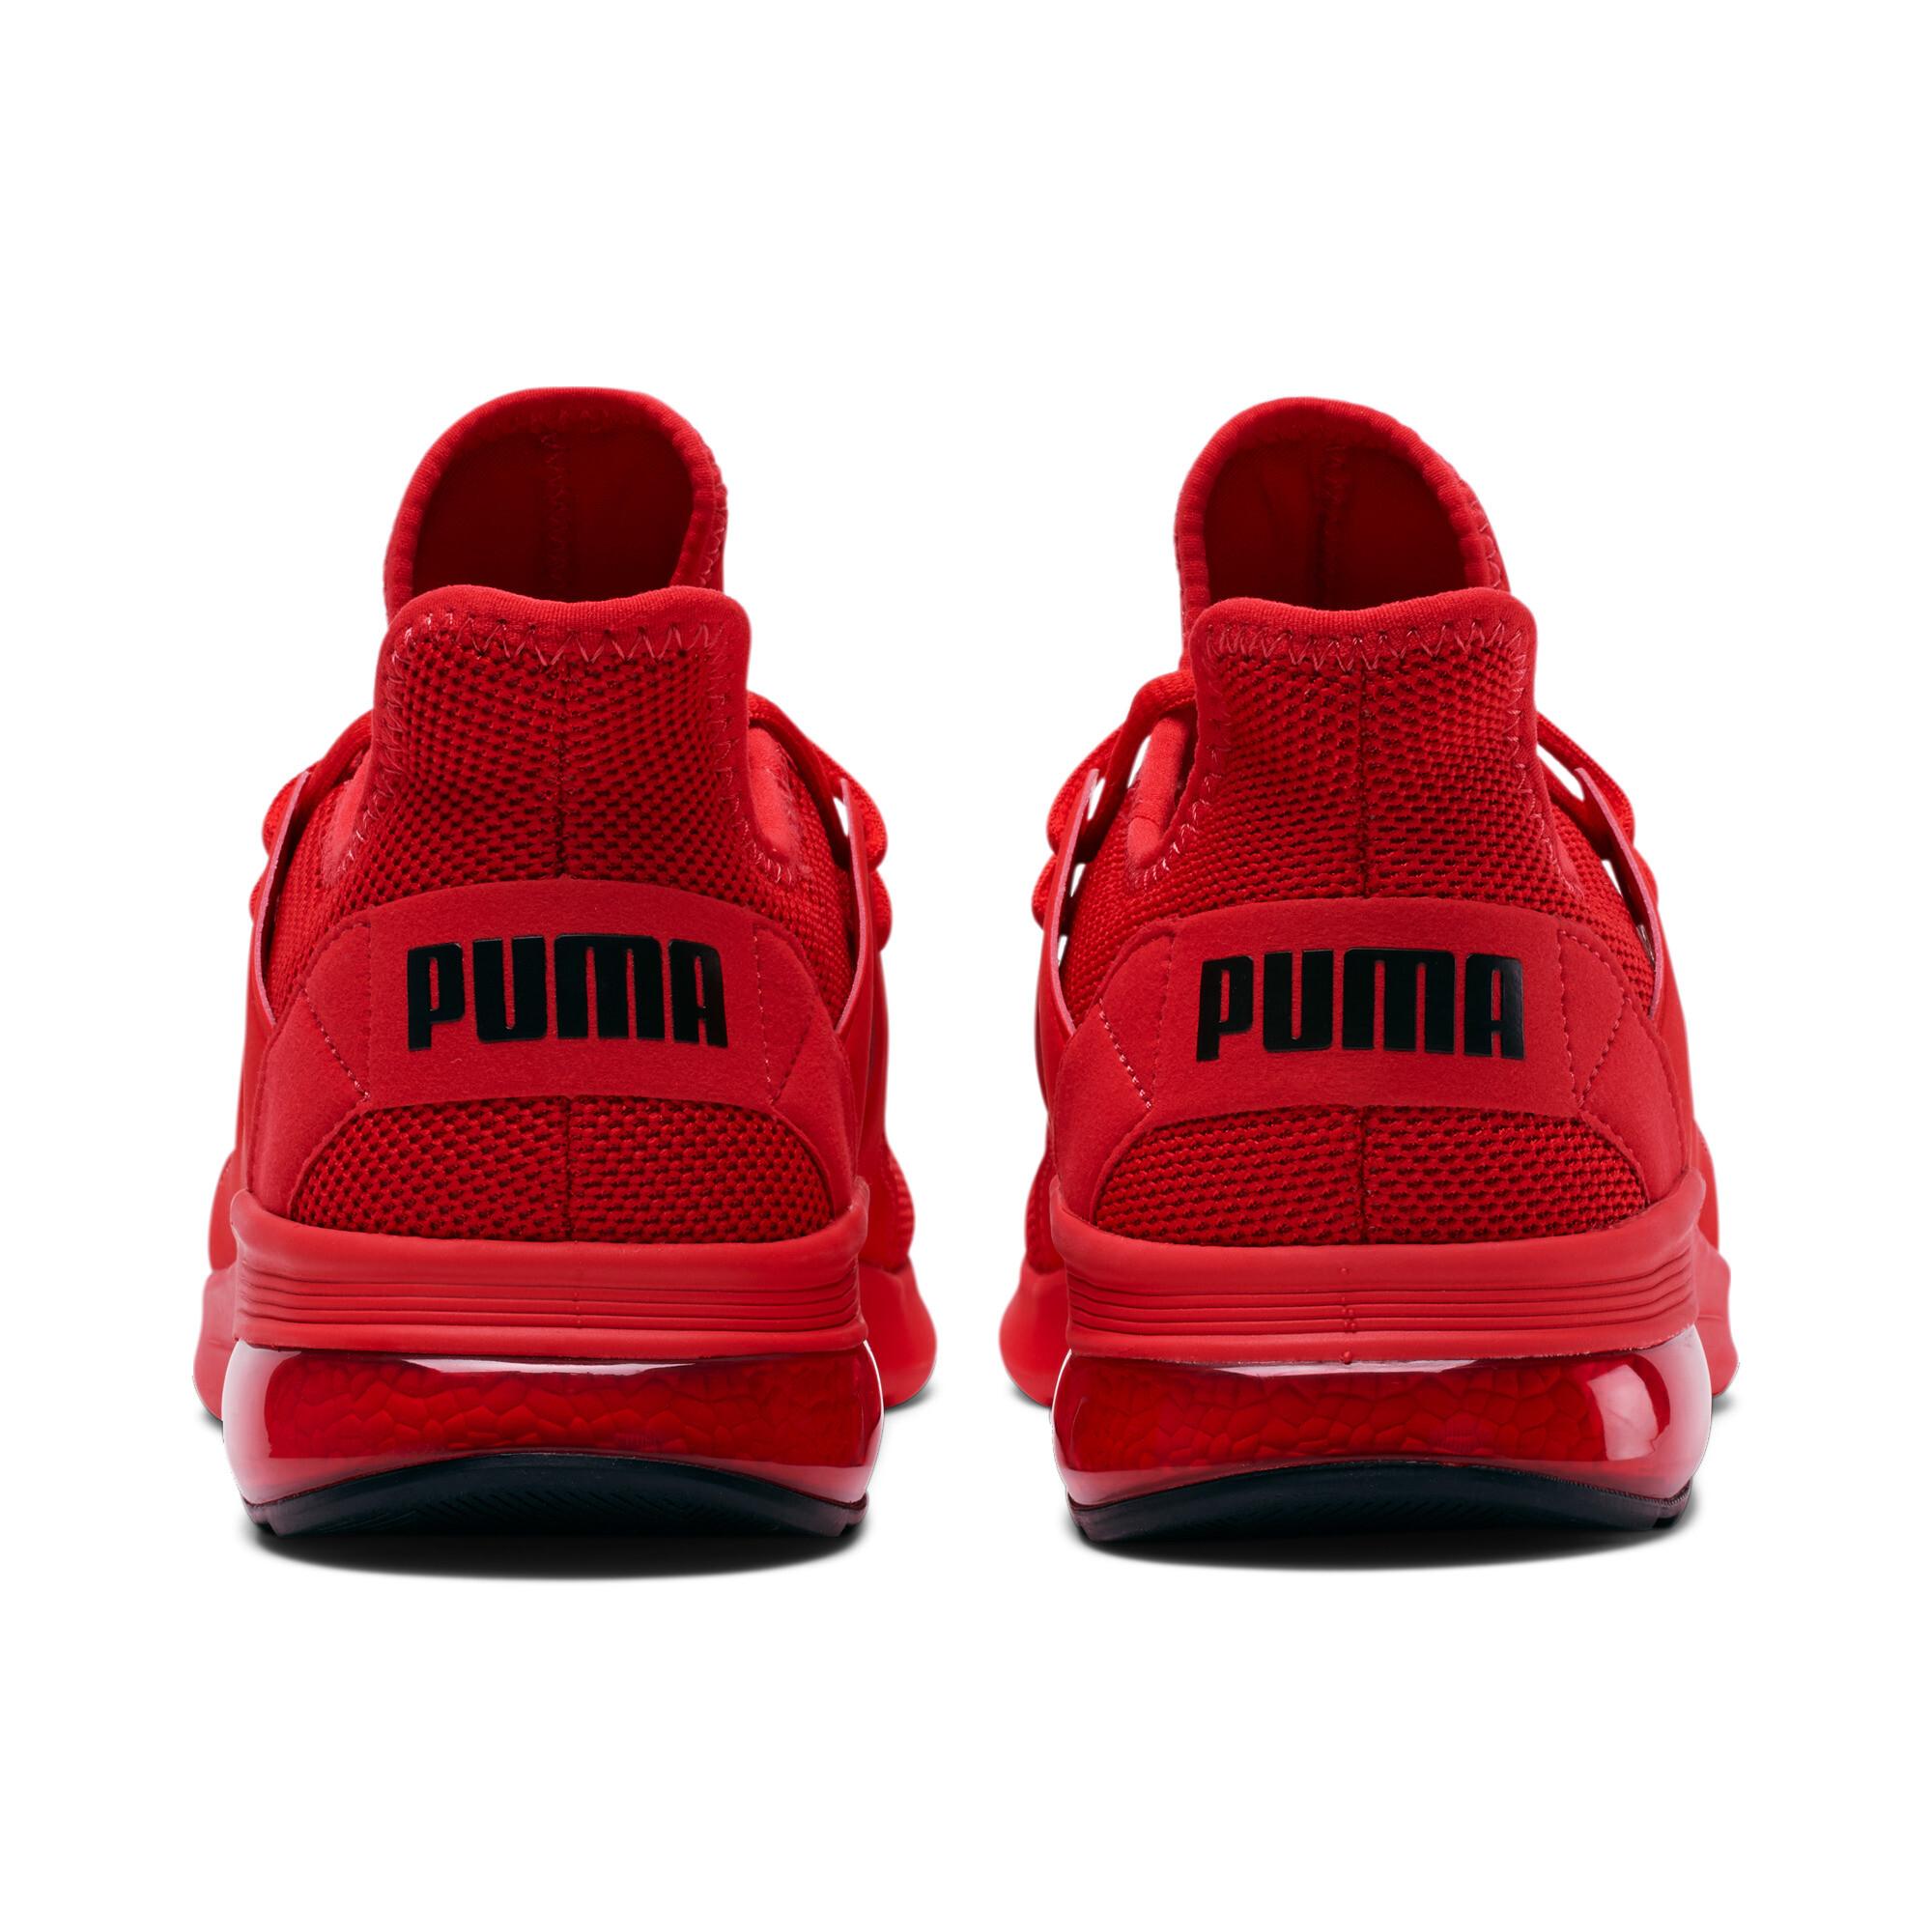 PUMA-Men-039-s-Electron-Street-Sneakers thumbnail 30